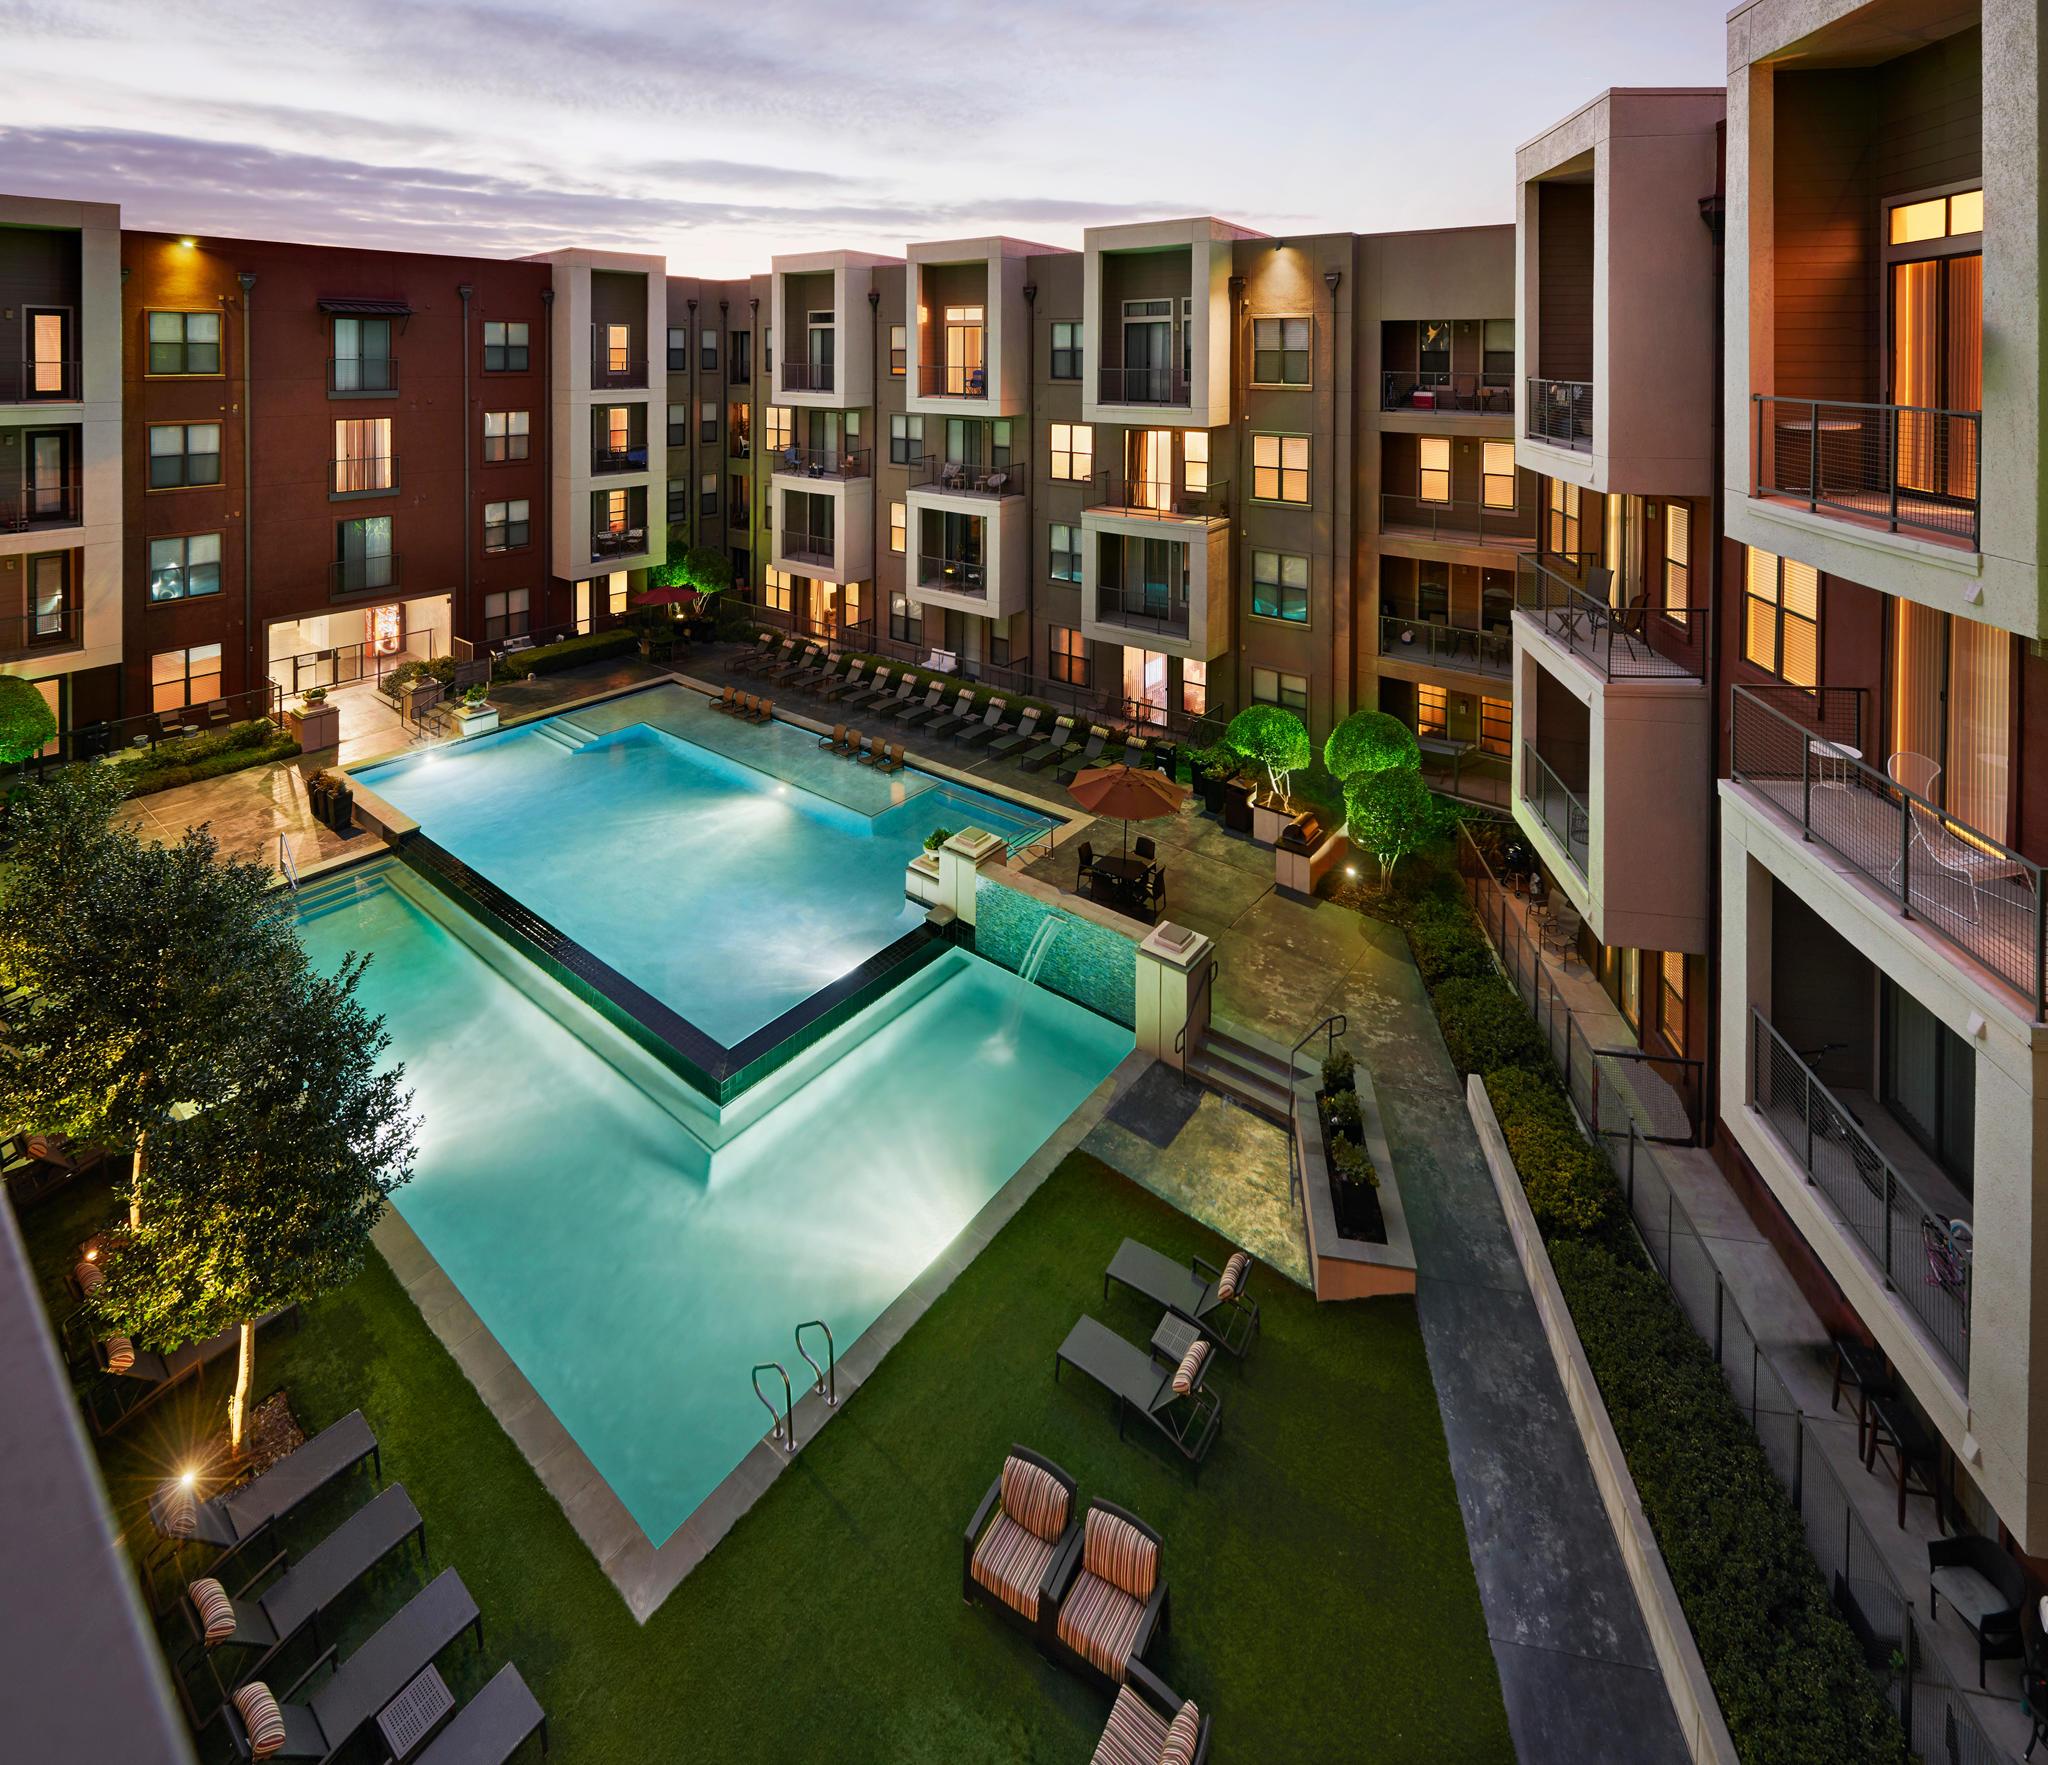 Camden Design District Apartments image 11